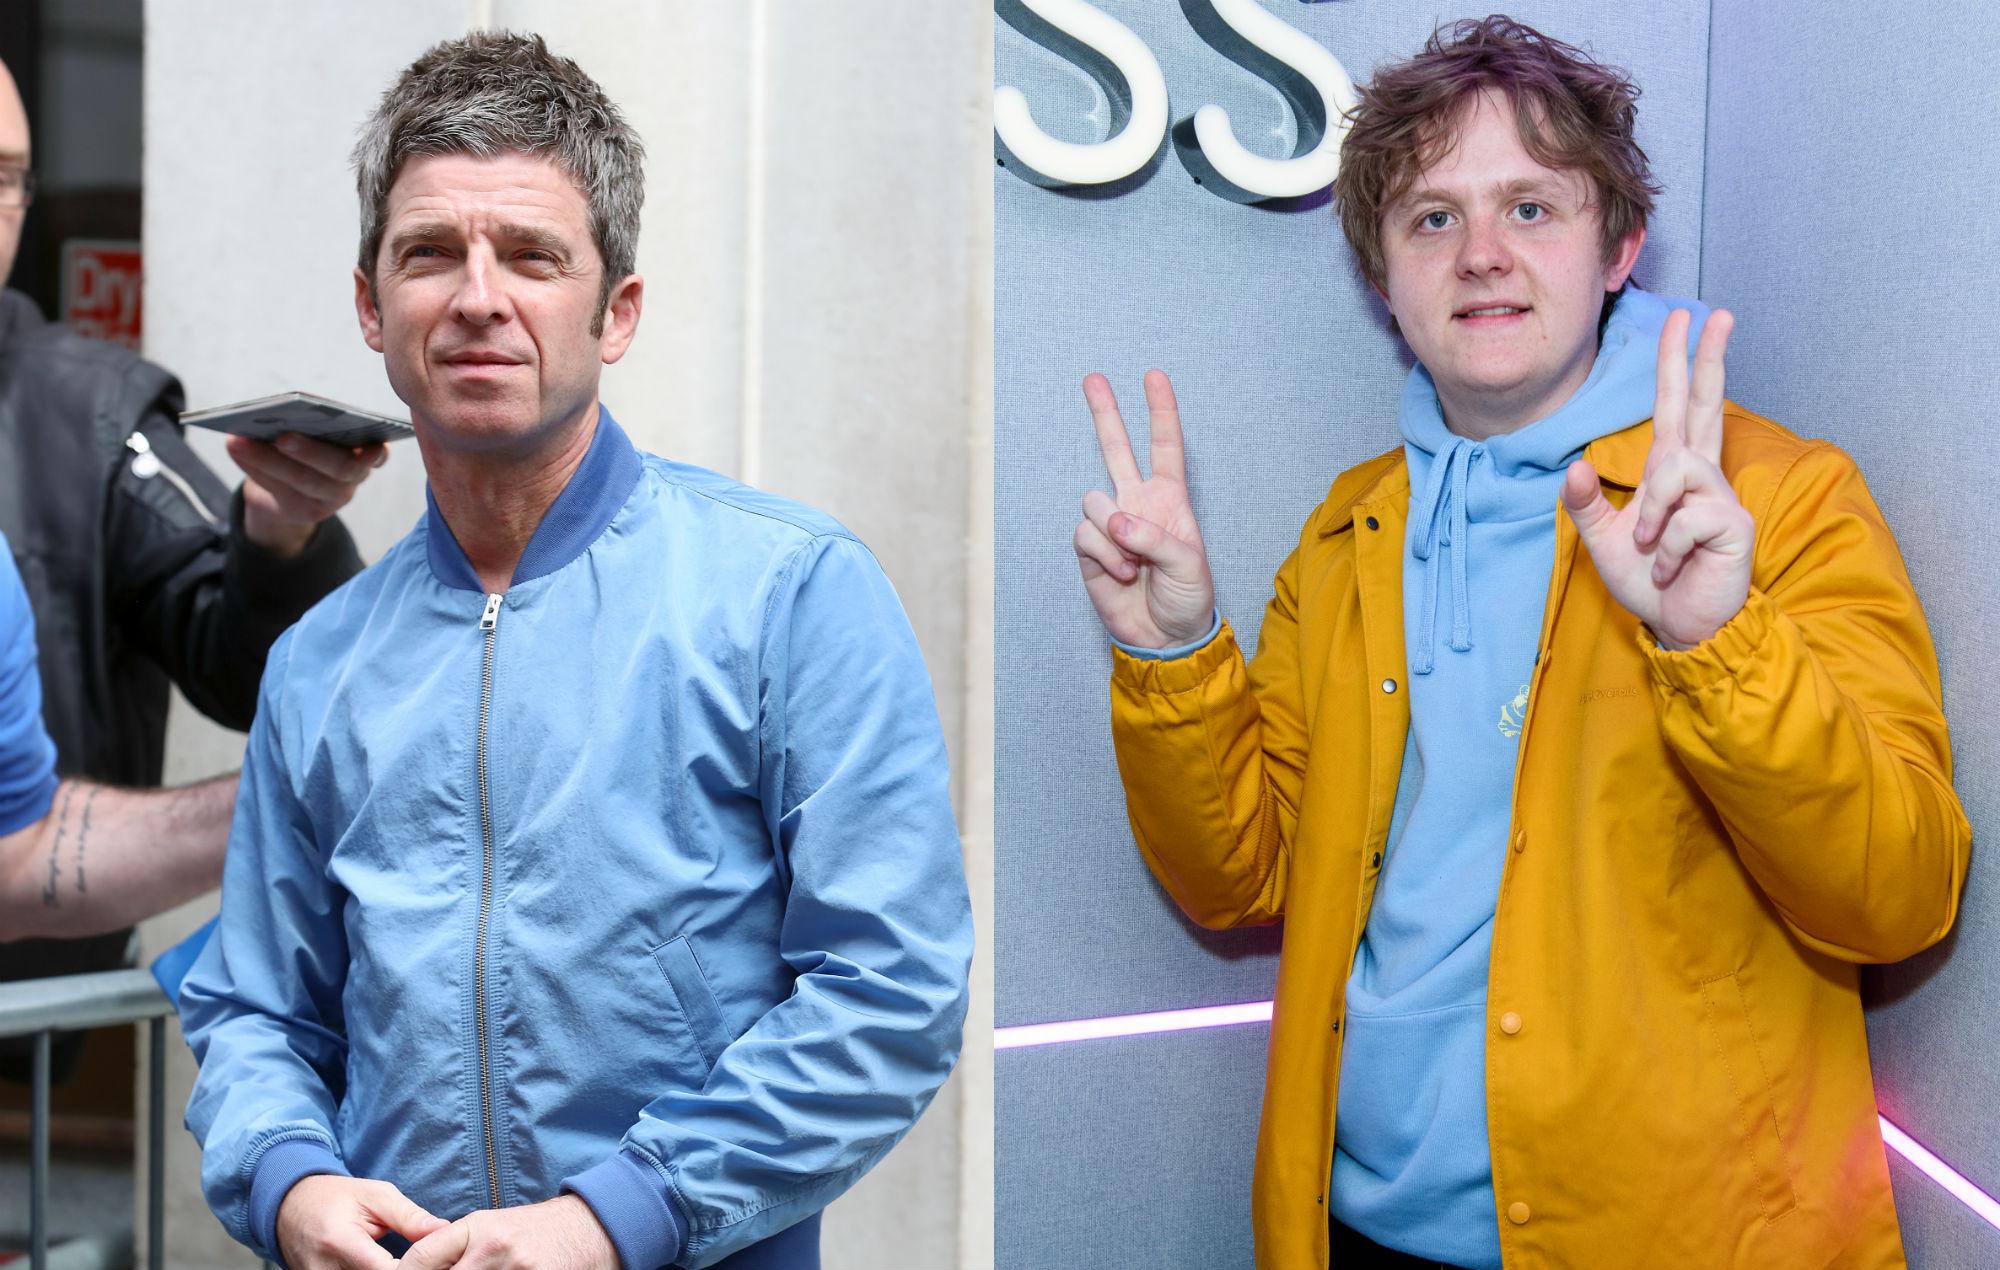 Noel Gallagher / Lewis Capaldi